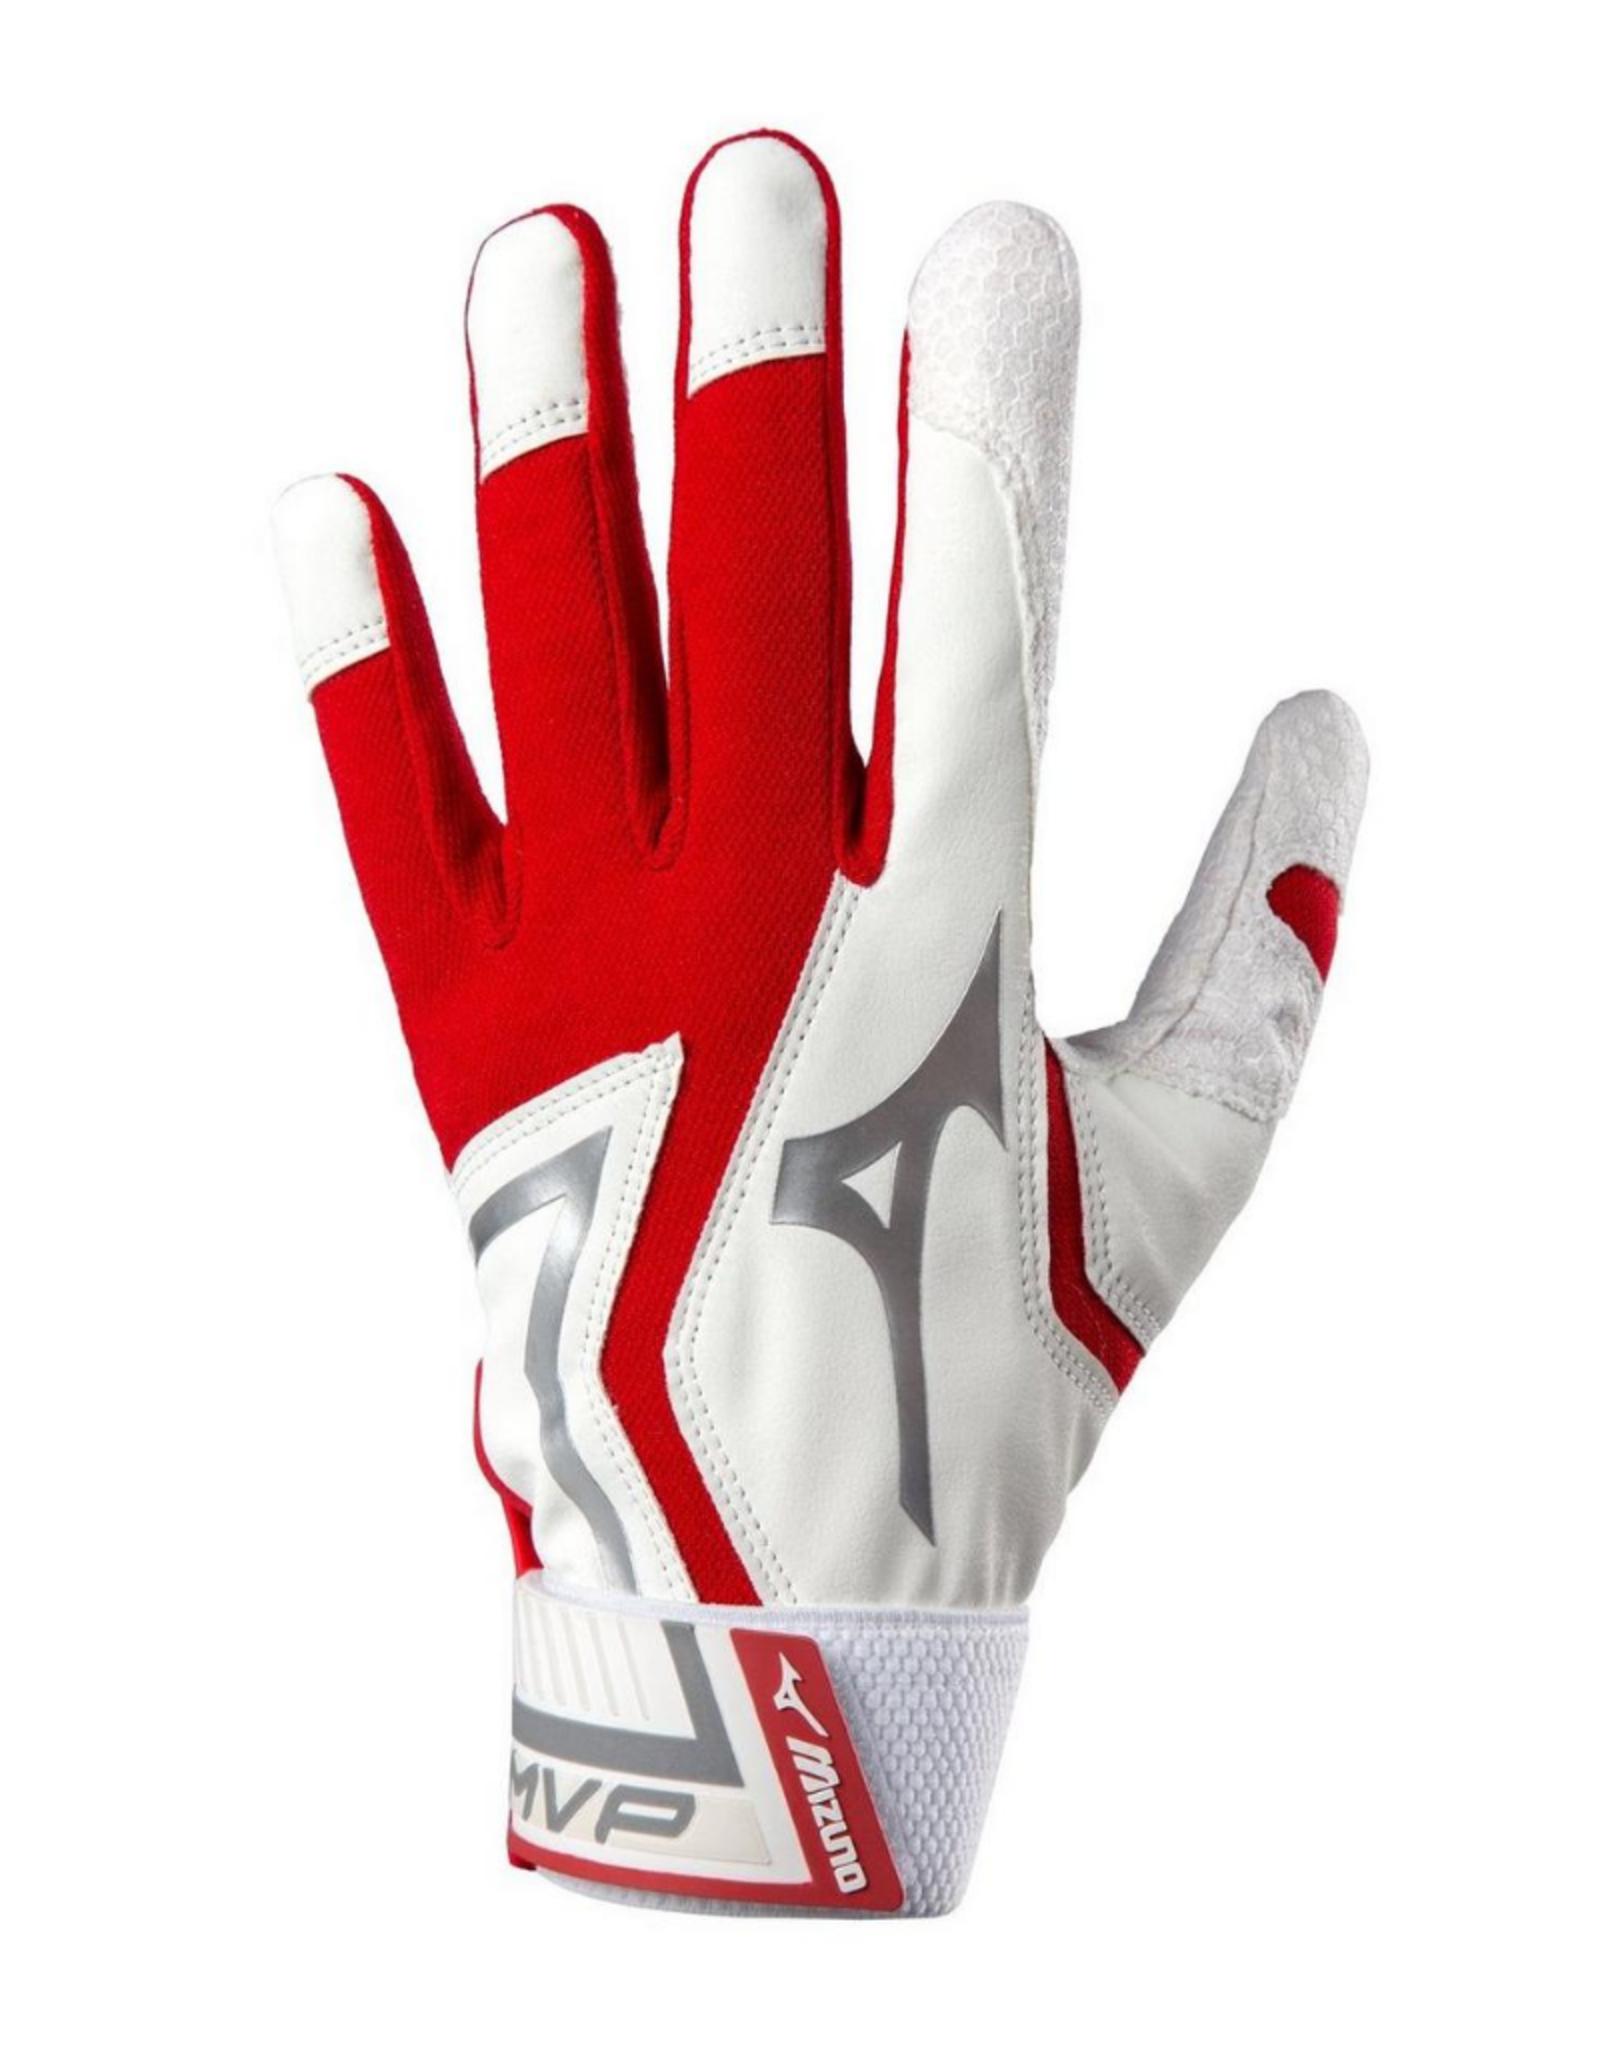 Mizuno MVP Adult Batting Gloves Red/White